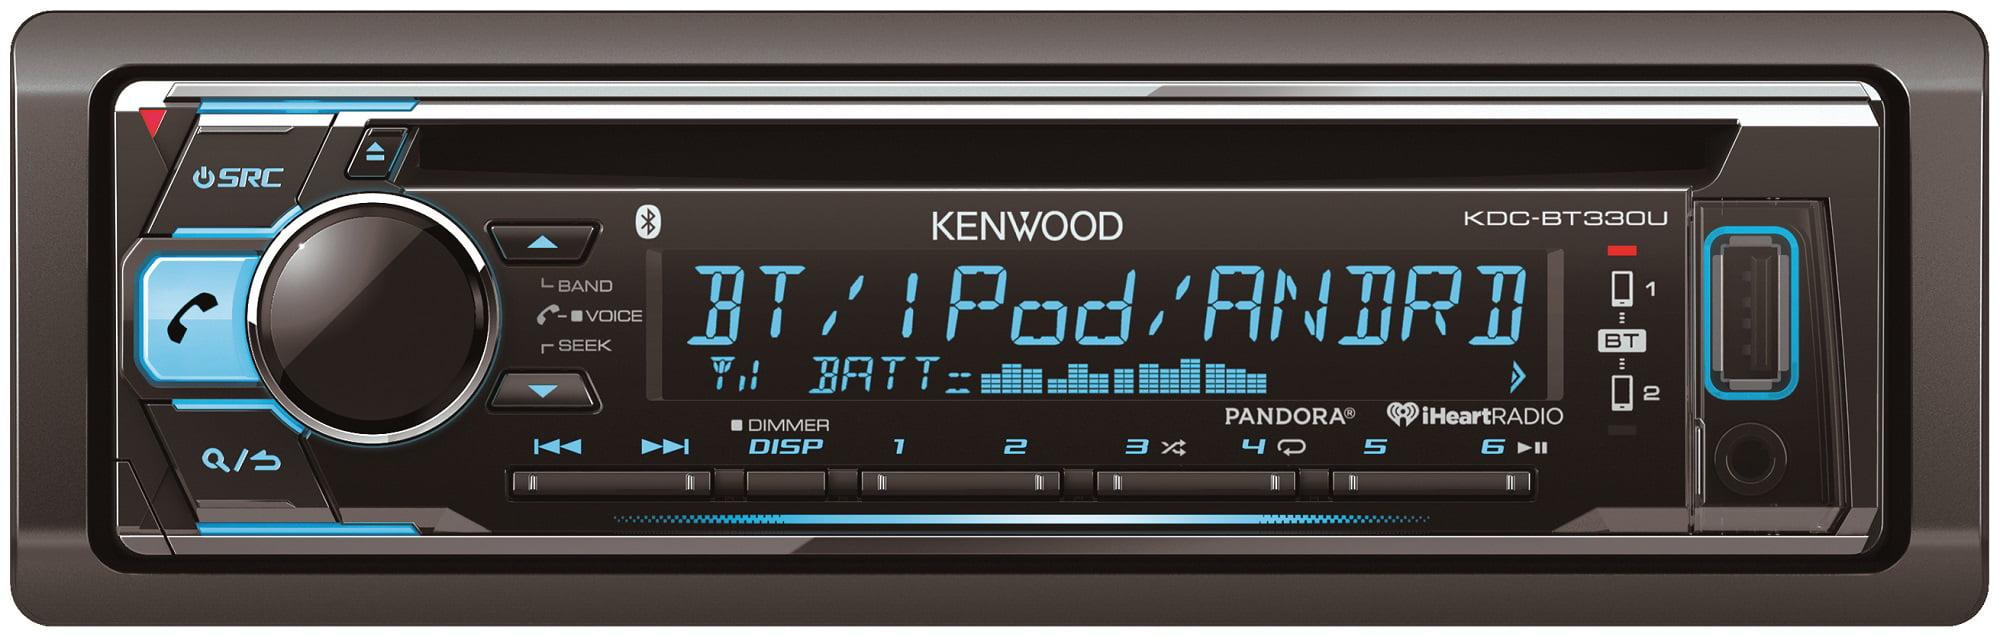 3bb97768 214a 4963 84c1 6f943f47def7_1.b97547793559aeb4b74eb7493d456aaa kenwood am fm cd in dash kdc bt330u receiver with built in kenwood kdc 210u wiring diagram at sewacar.co